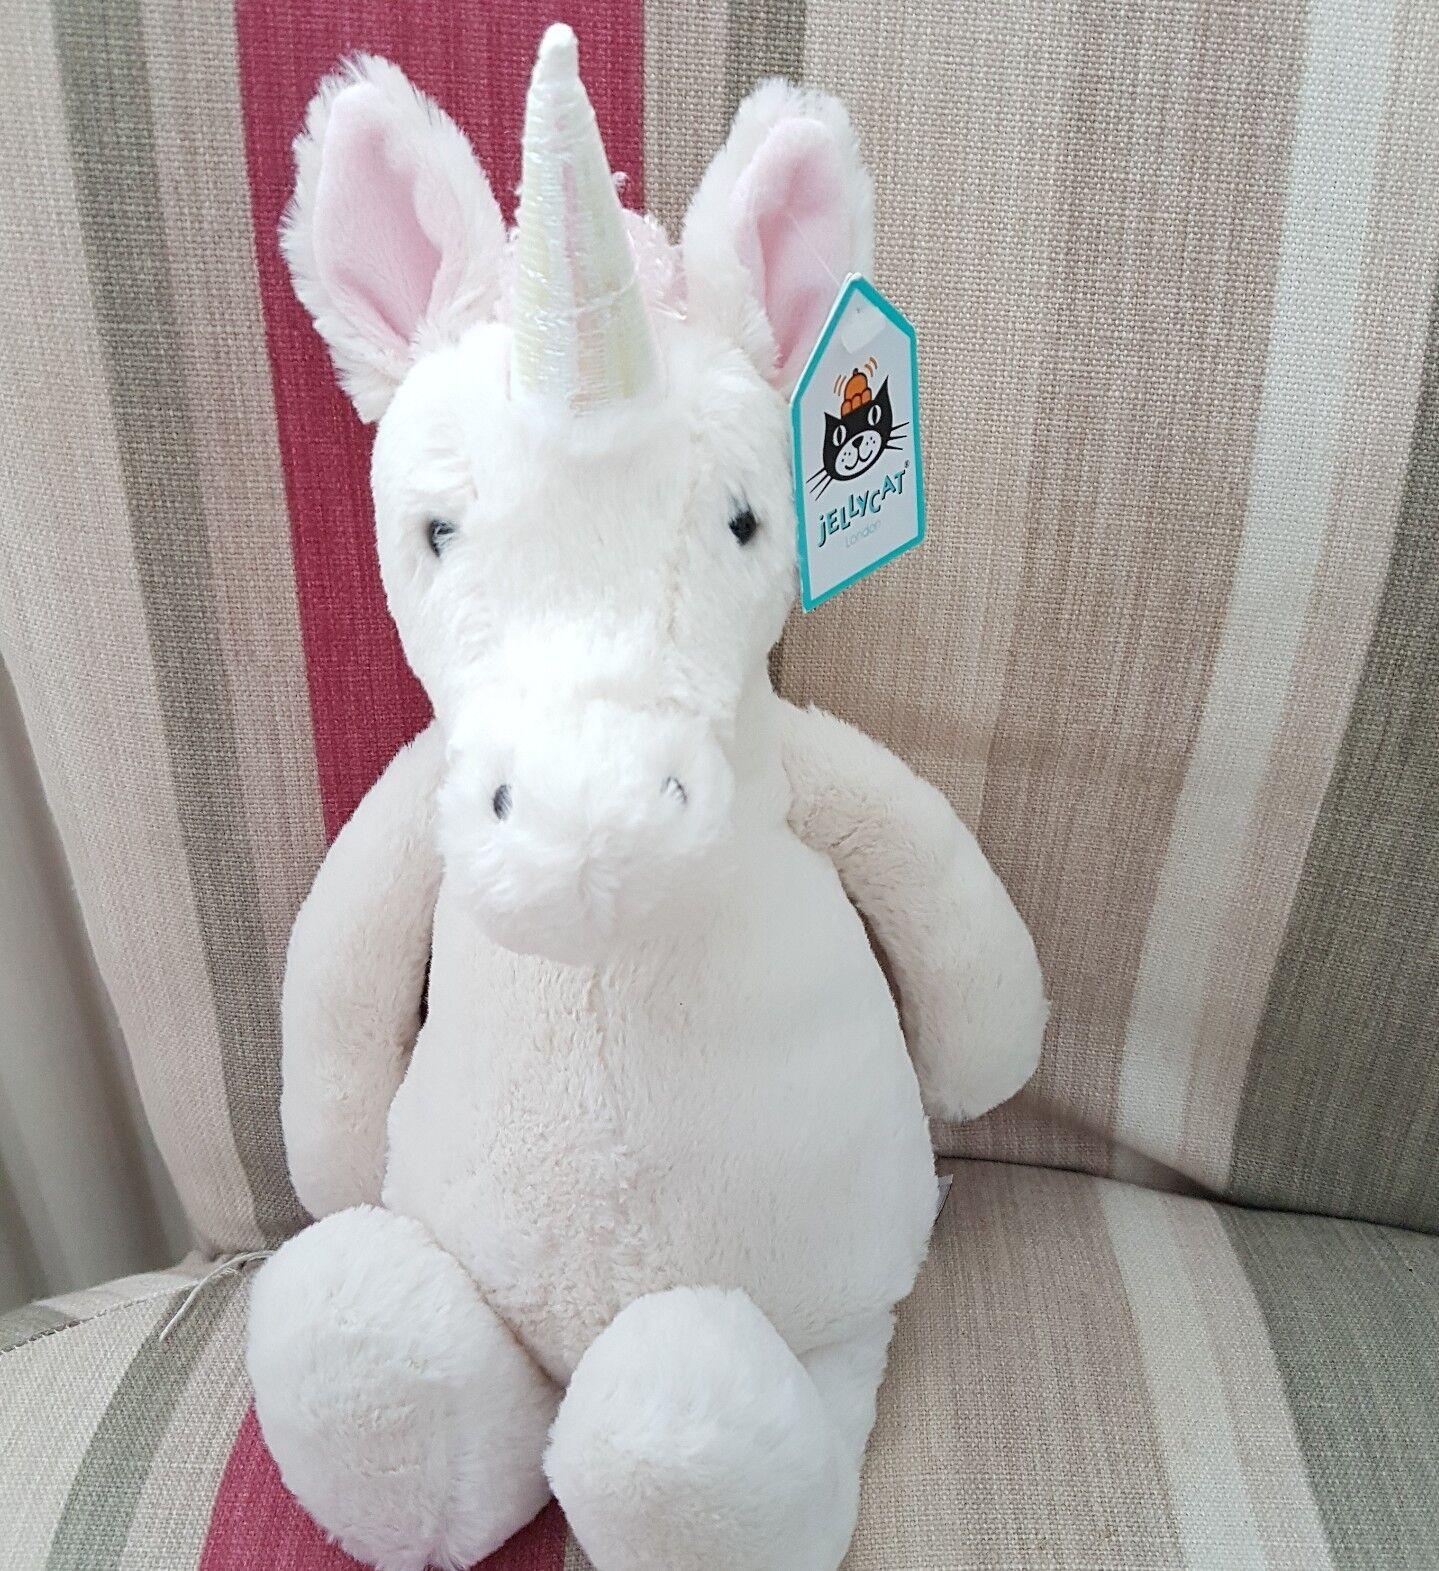 New Jellycat medium Bashful Weiß Unicorn Soft Toy Medium 12